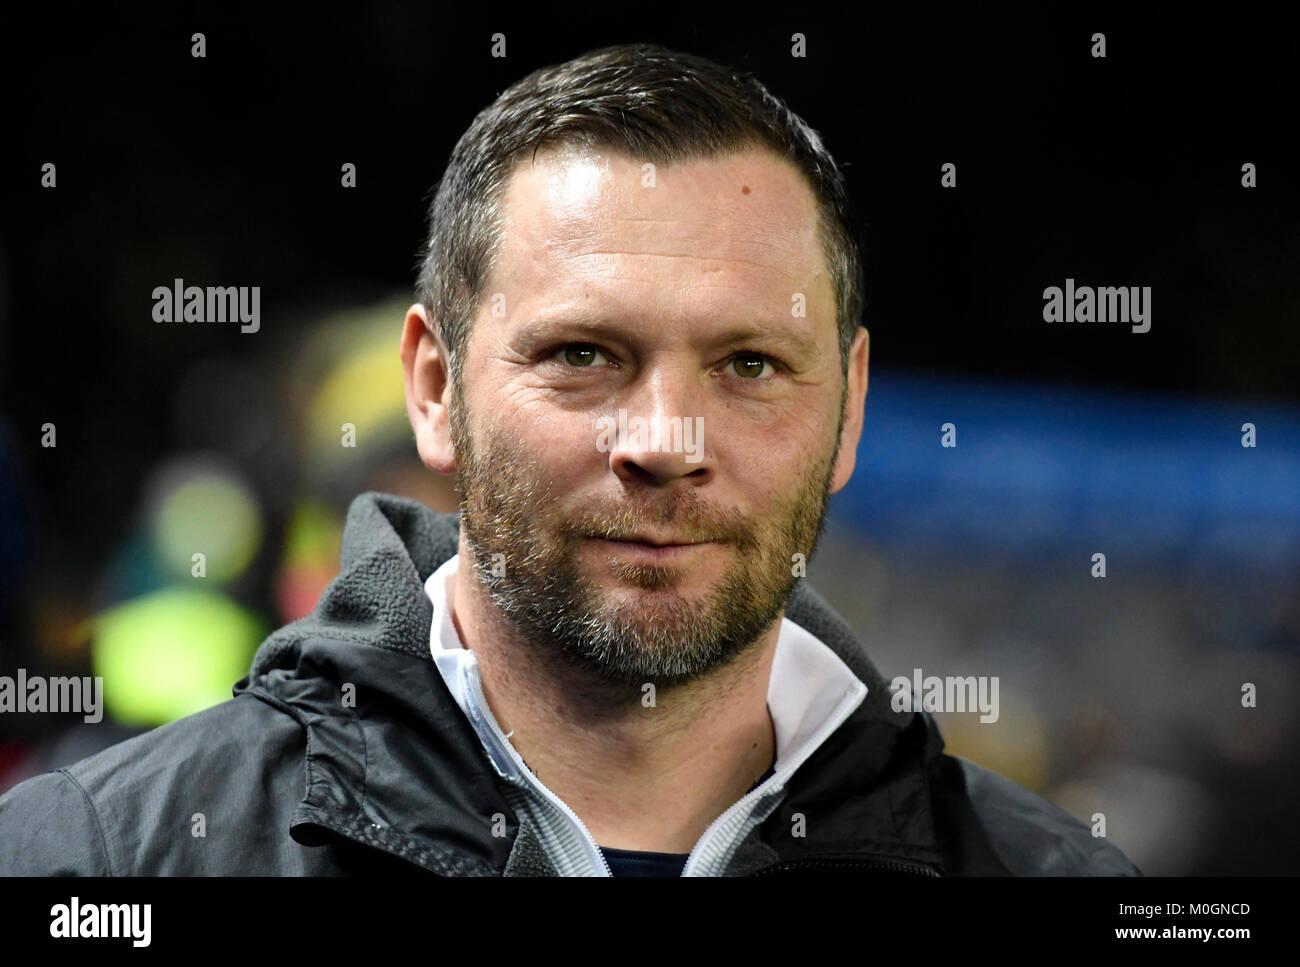 Berlin, Deutschland. 19 Jan, 2018. Trainer Pal DARDAI (B), Portraet, Portrait, Kopf, Fussball 1. 1. Fussballbundesliga, Stockbild